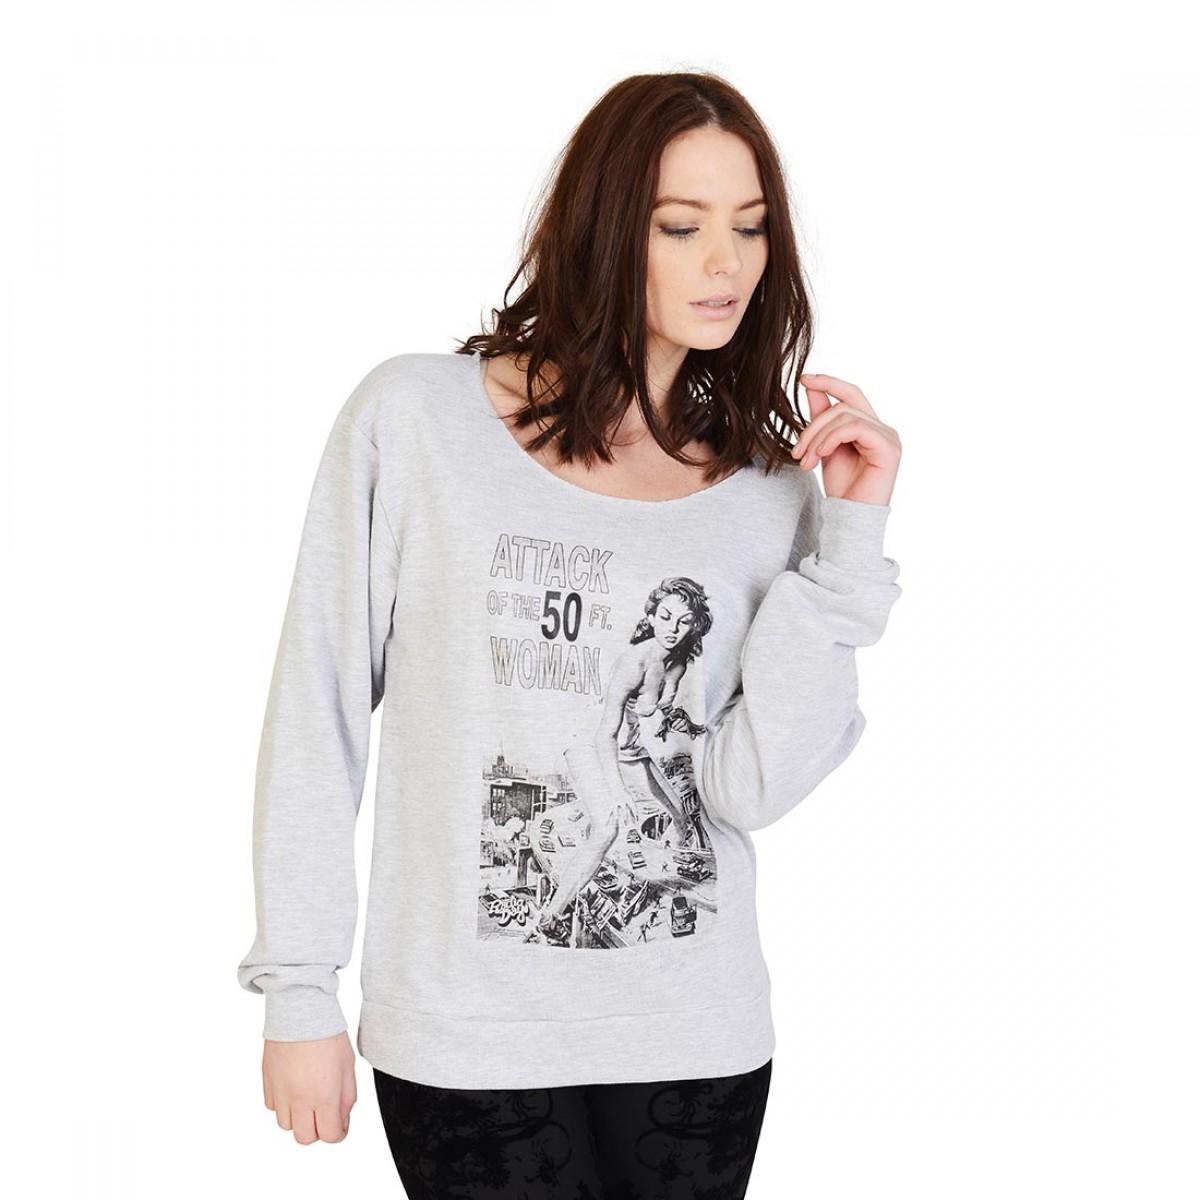 Cako attack of the 50ft woman sweatshirt farranoir for Attack of the 50 foot woman t shirt